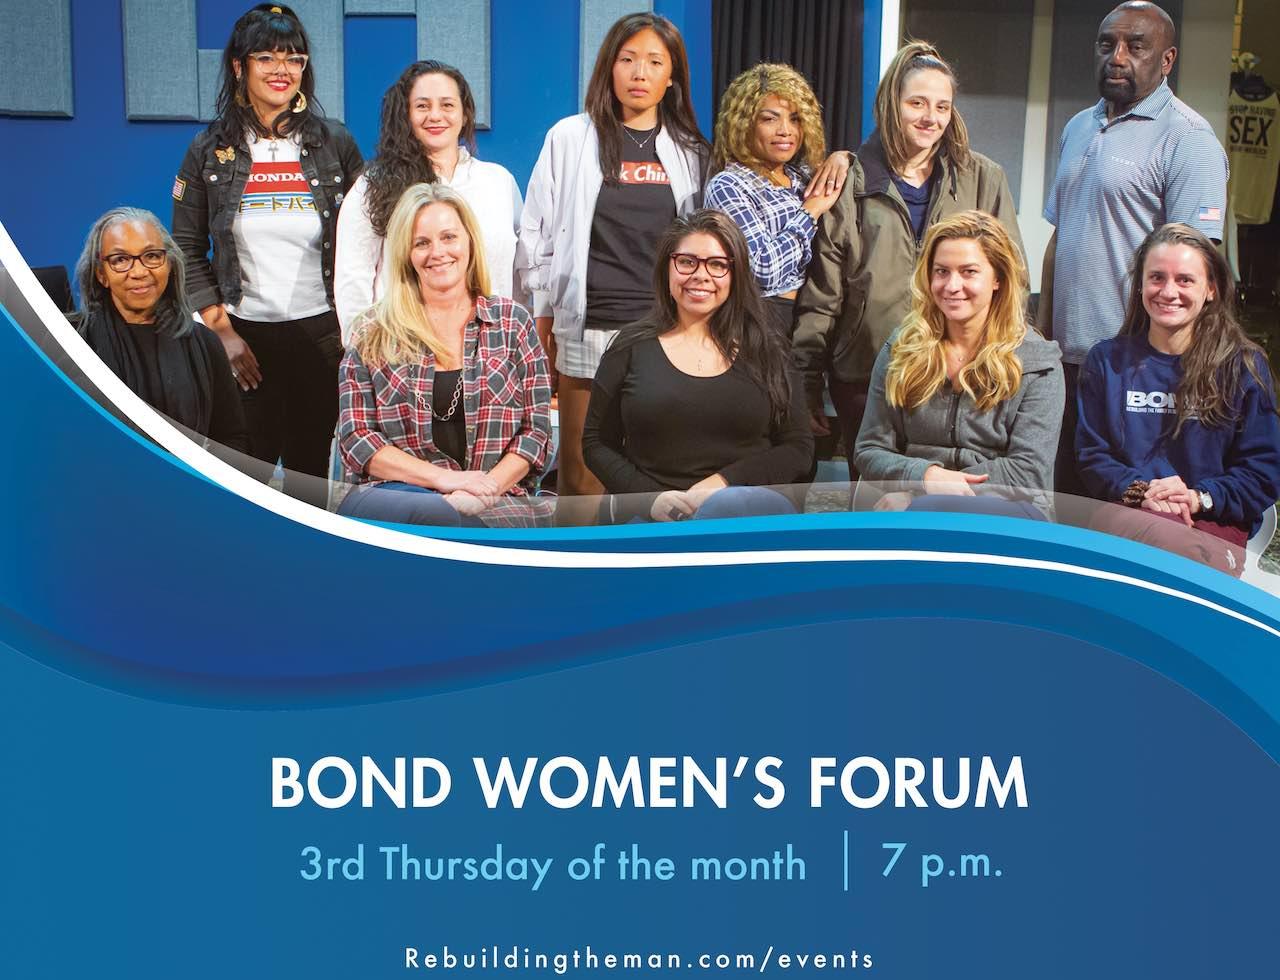 Women's Forum 3rd Thursday, 7pm